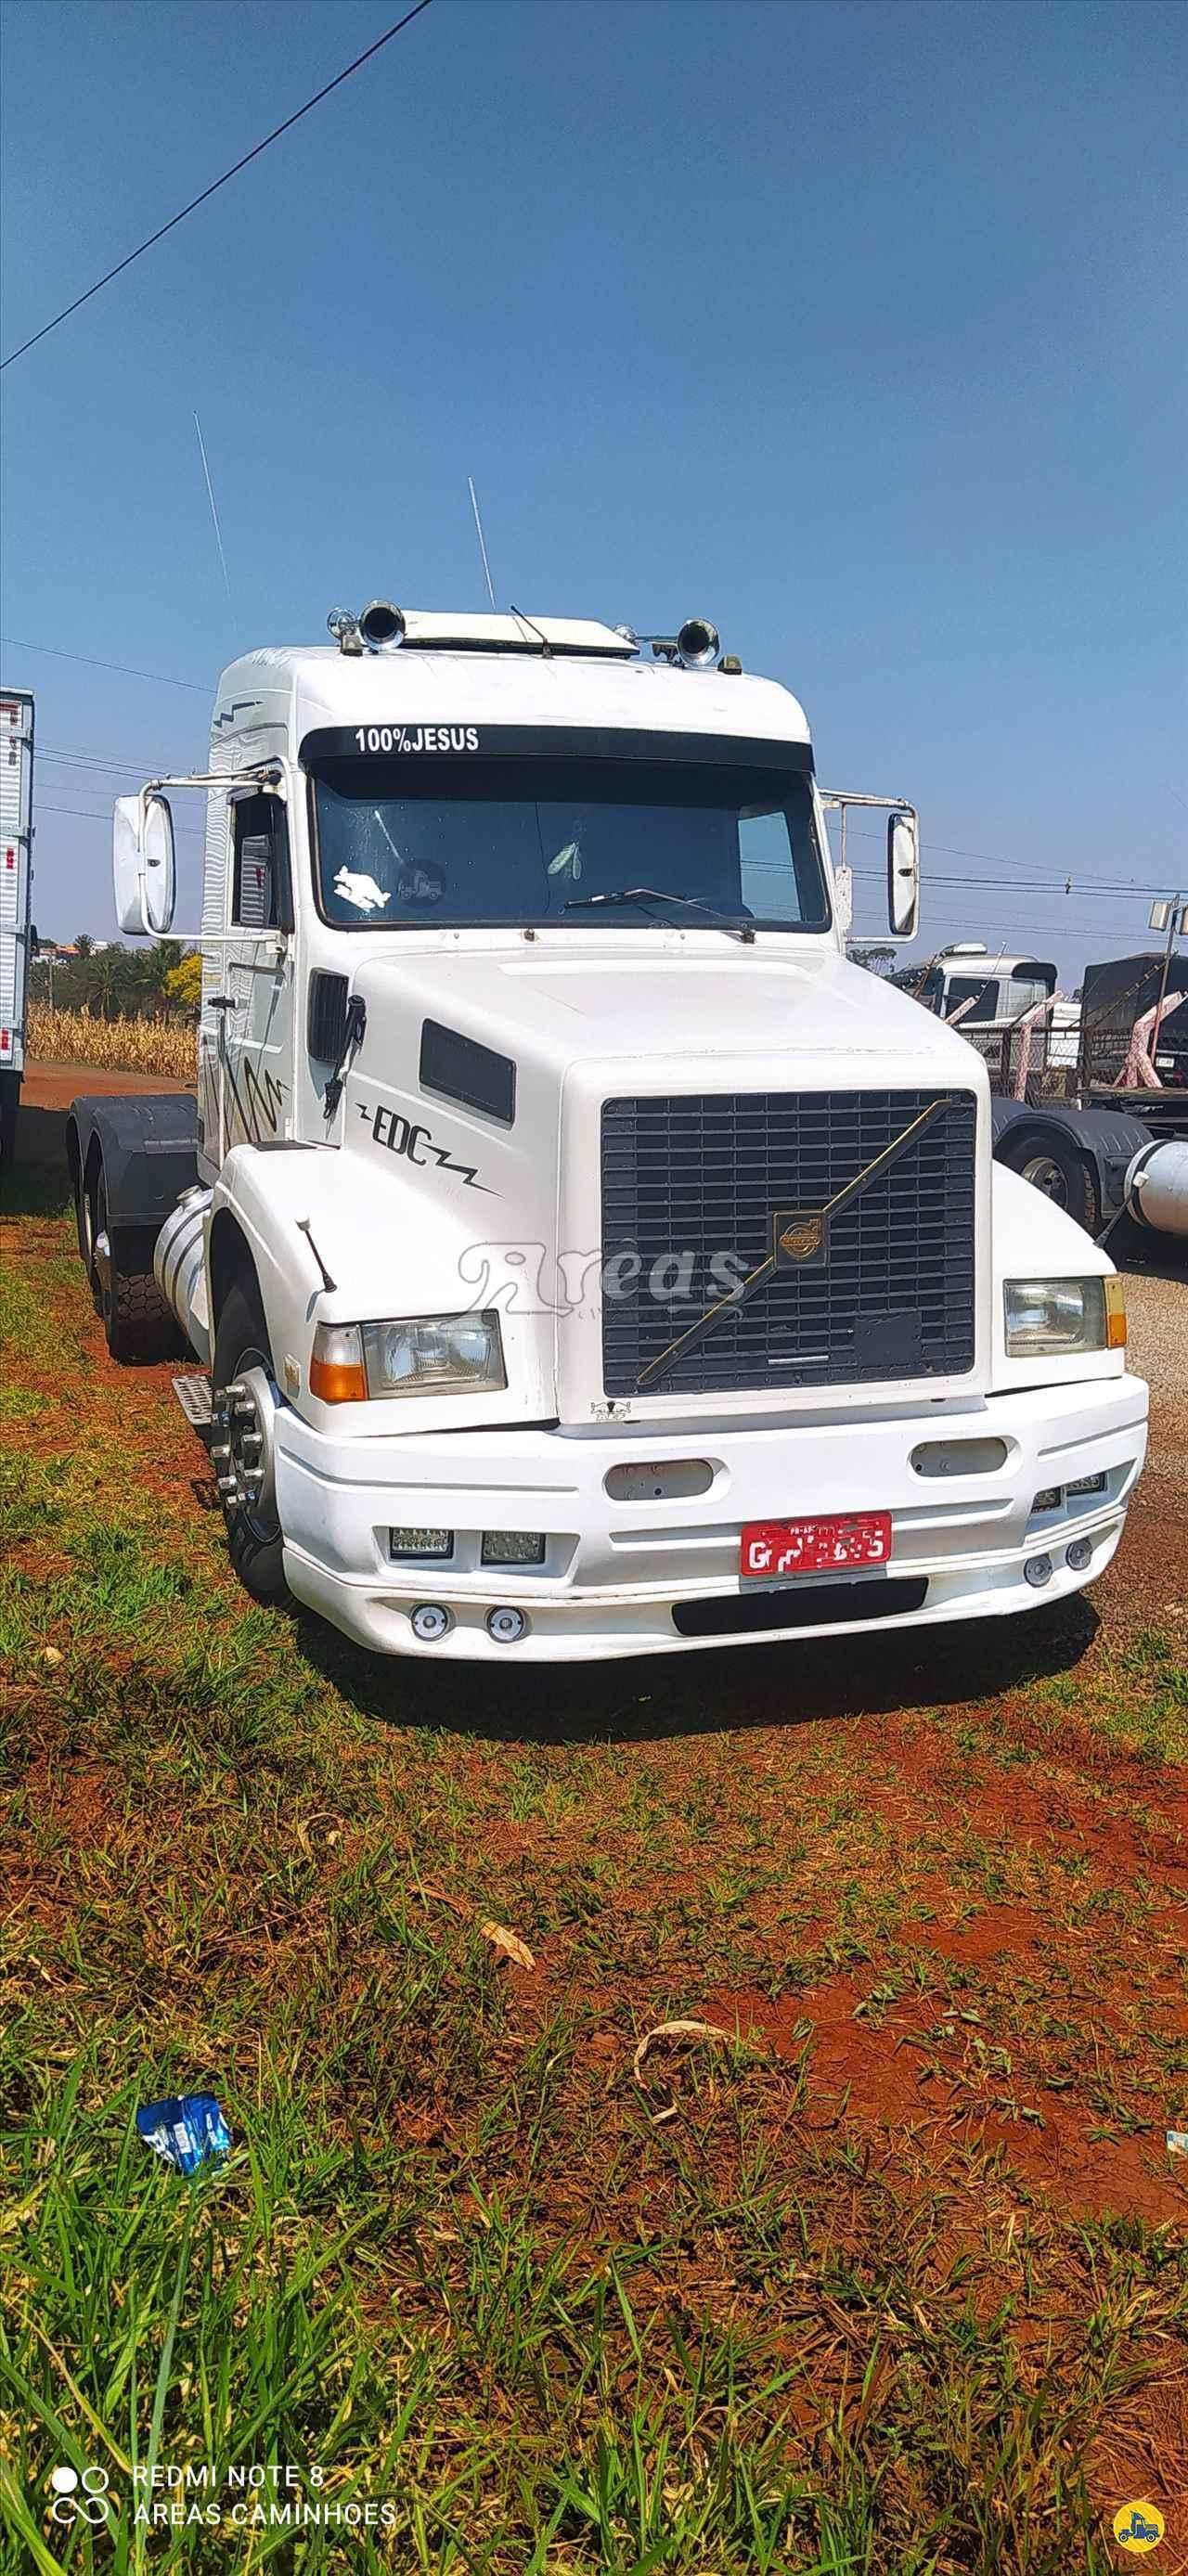 CAMINHAO VOLVO VOLVO NL12 360 Cavalo Mecânico Truck 6x2 Arêas Caminhões MARINGA PARANÁ PR